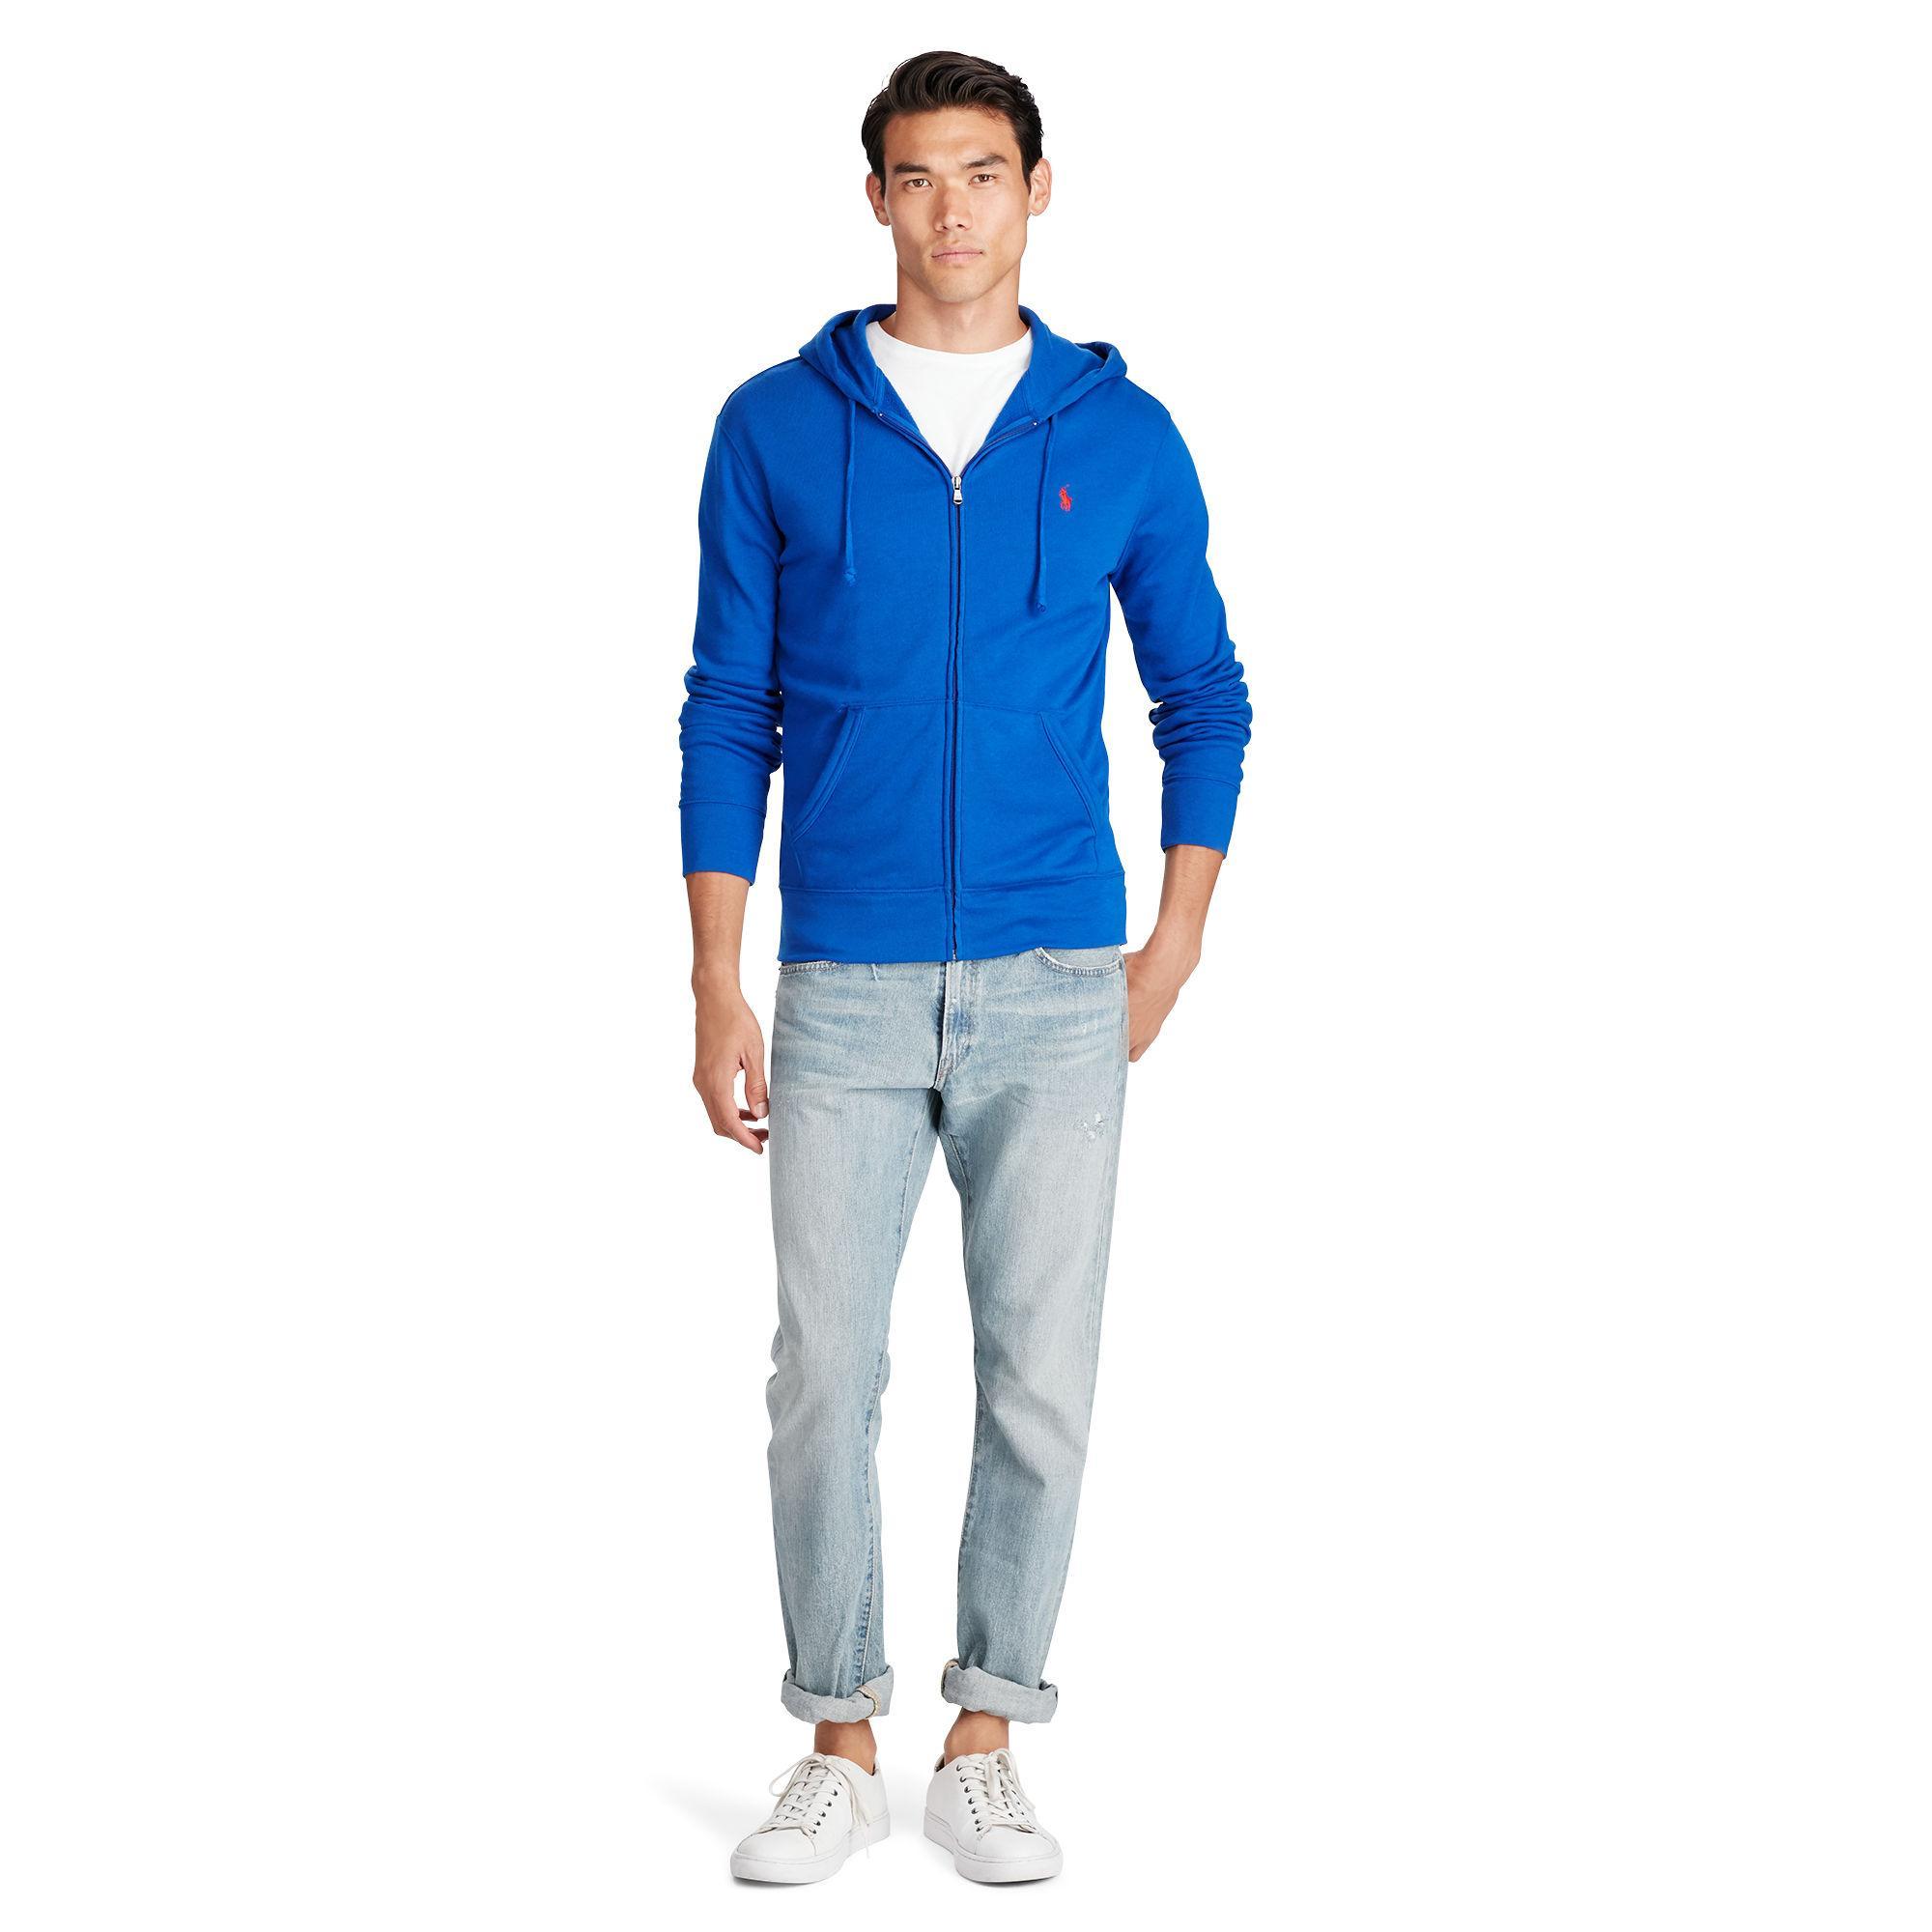 polo ralph lauren french terry zip hoodie sweatshirt in blue for men lyst. Black Bedroom Furniture Sets. Home Design Ideas